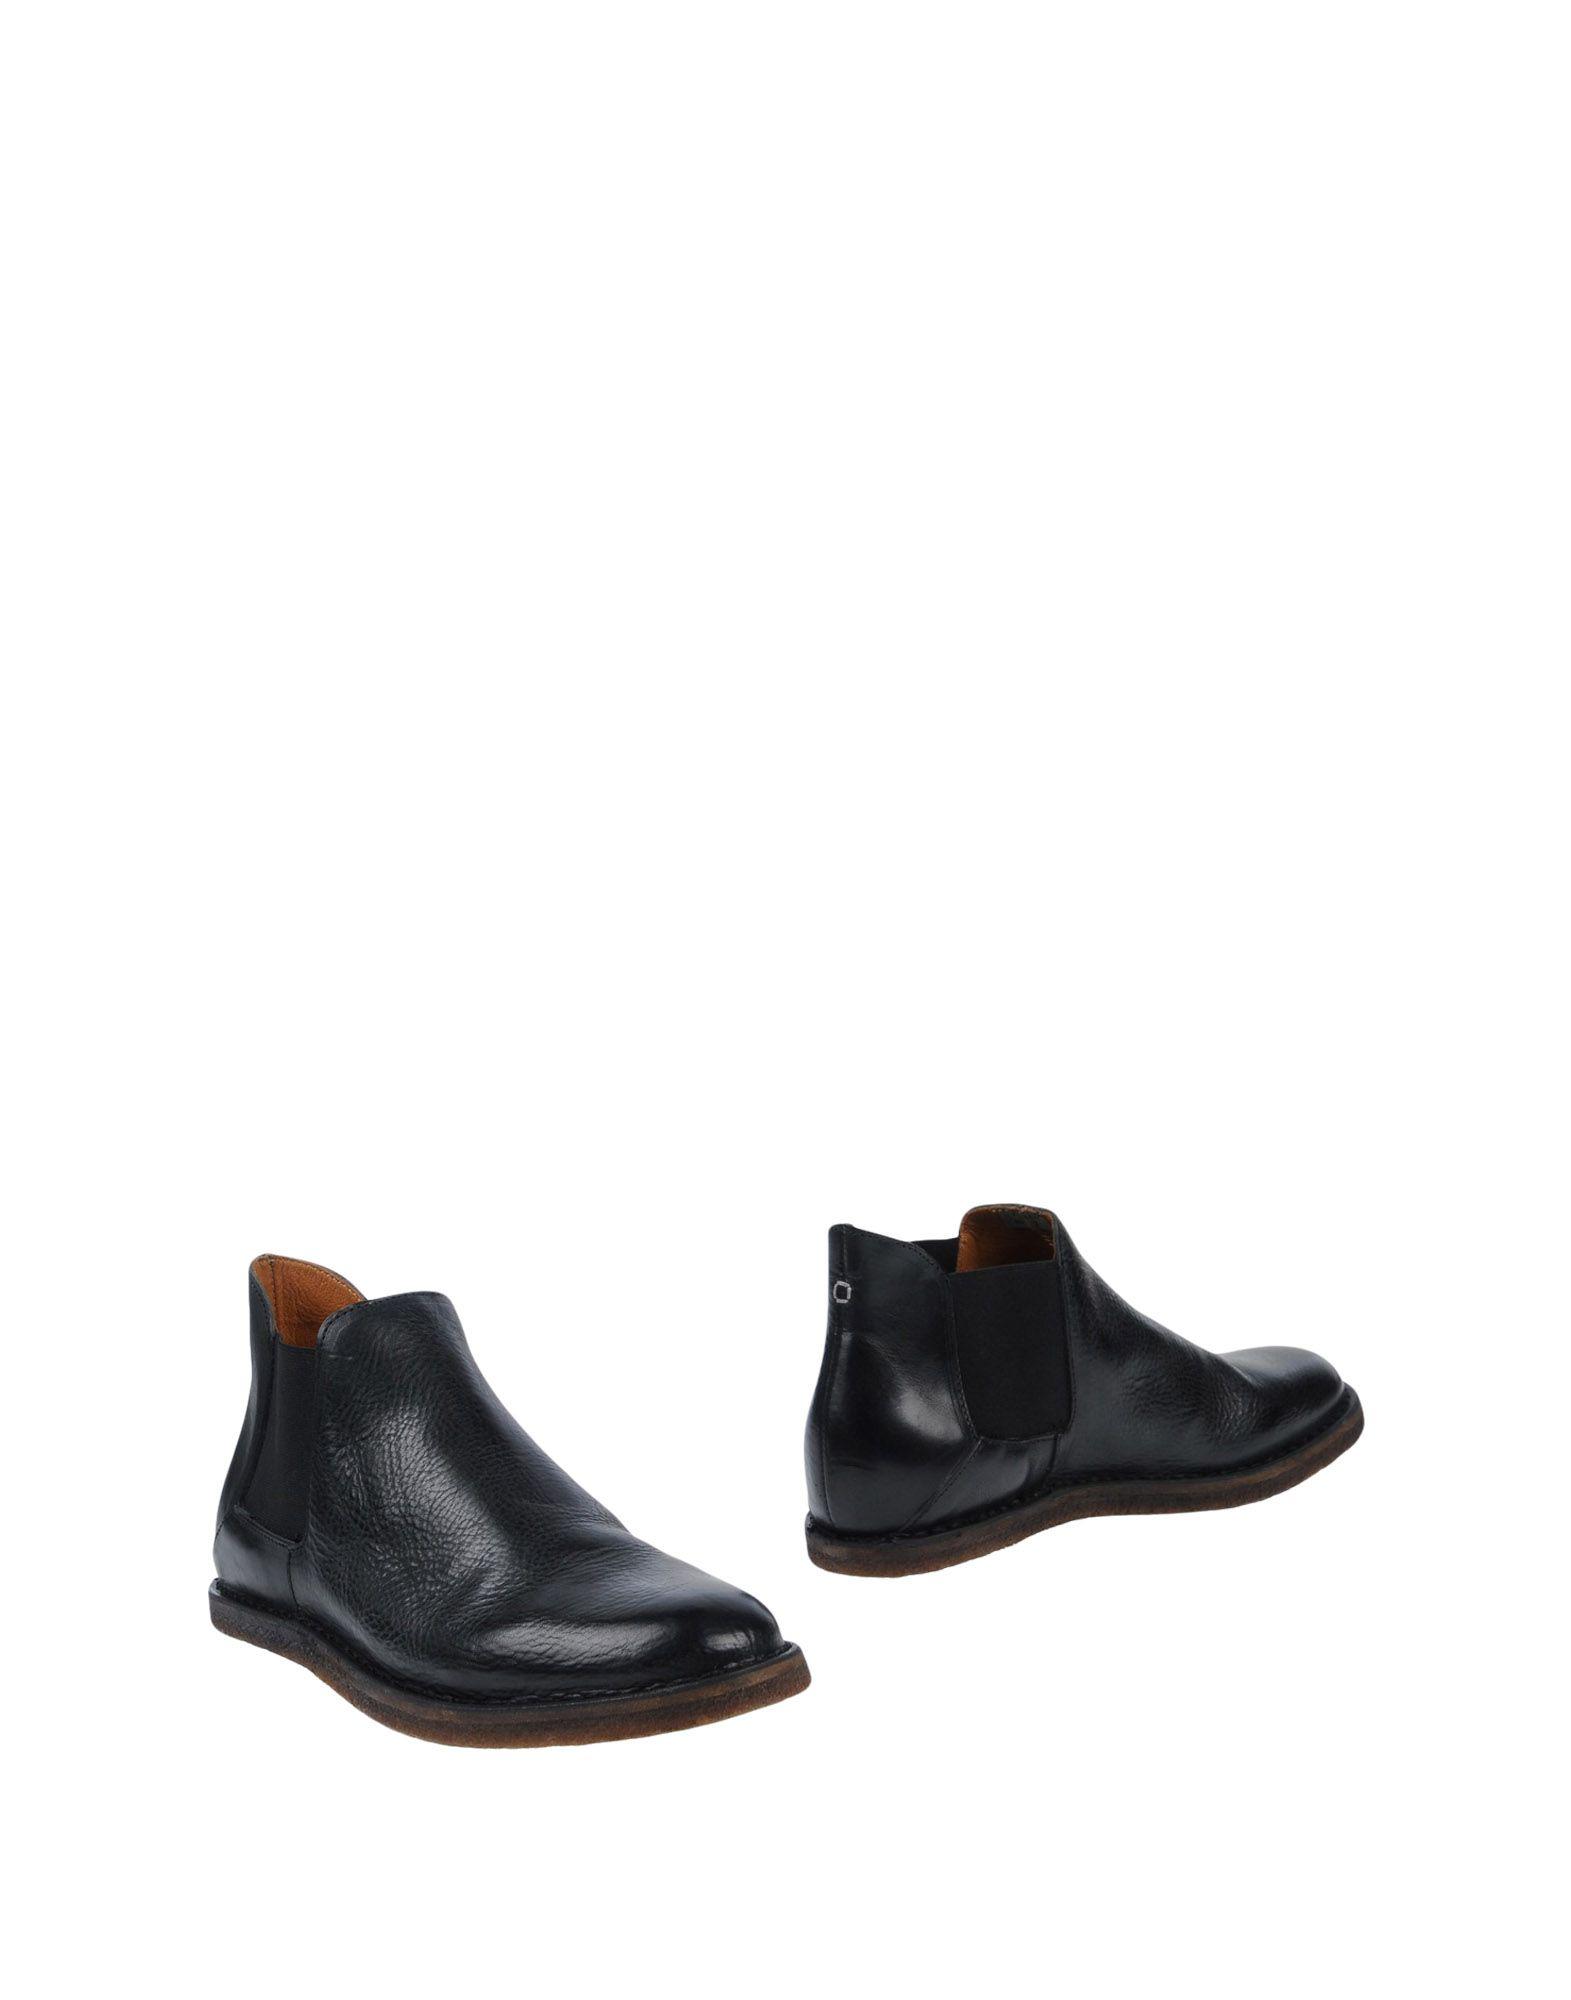 COLLECTION PRIVĒE? Полусапоги и высокие ботинки collection privēe полусапоги и высокие ботинки